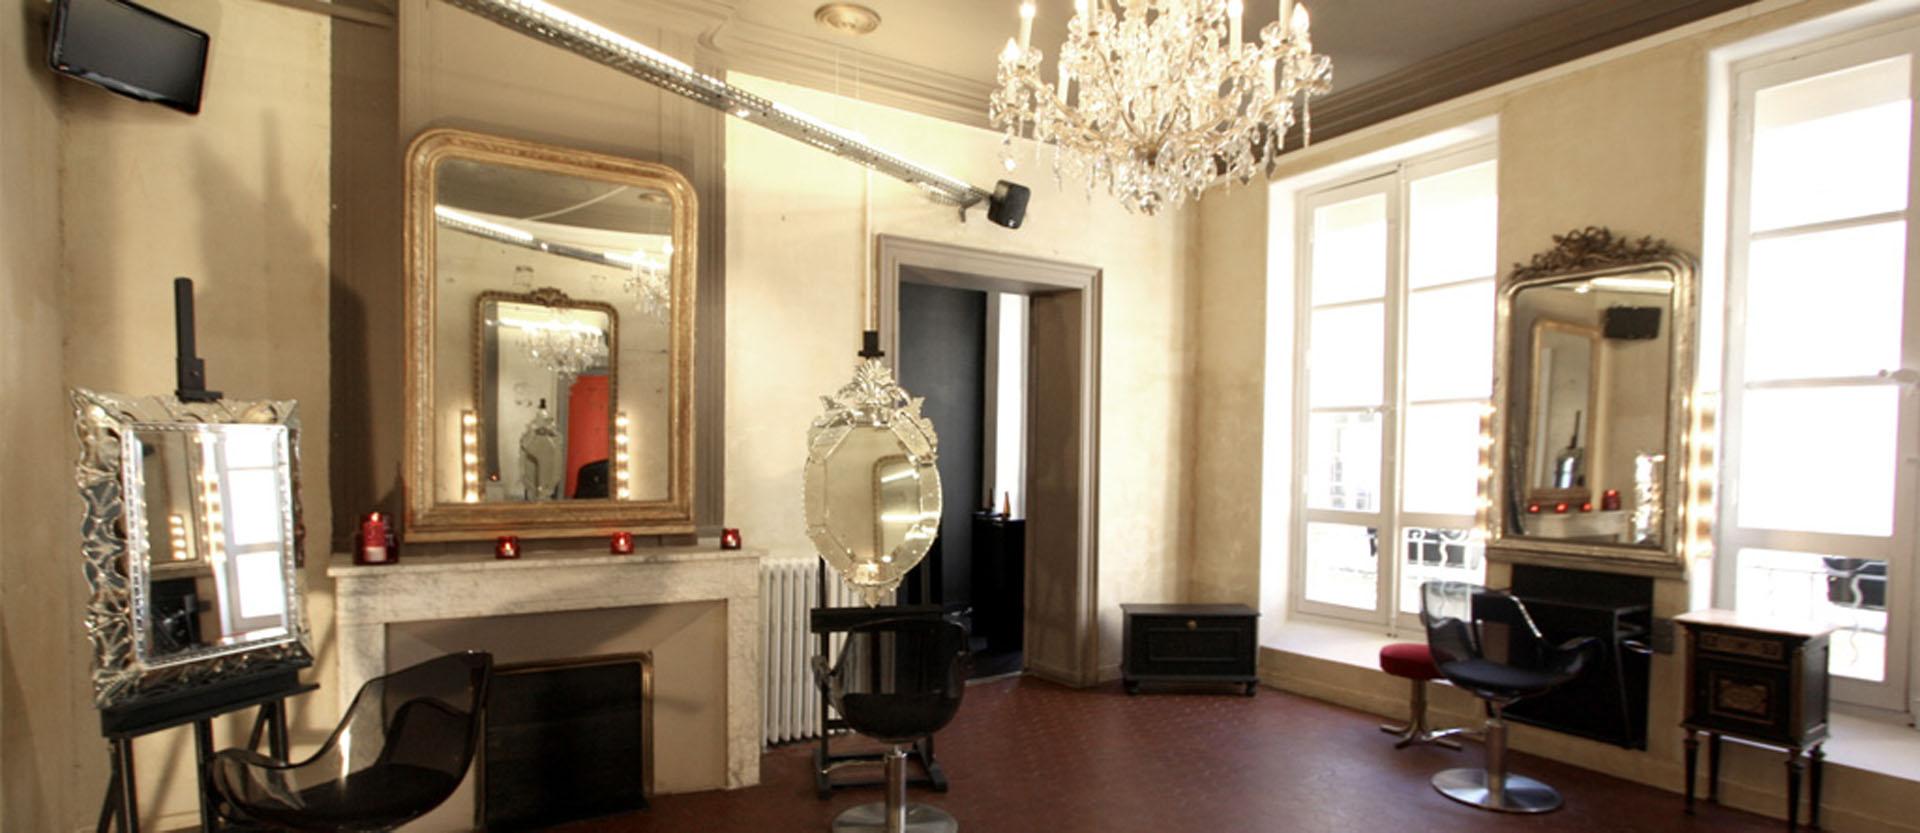 coiffirst aix en provence red banana studio concepteur d 39 int rieur. Black Bedroom Furniture Sets. Home Design Ideas